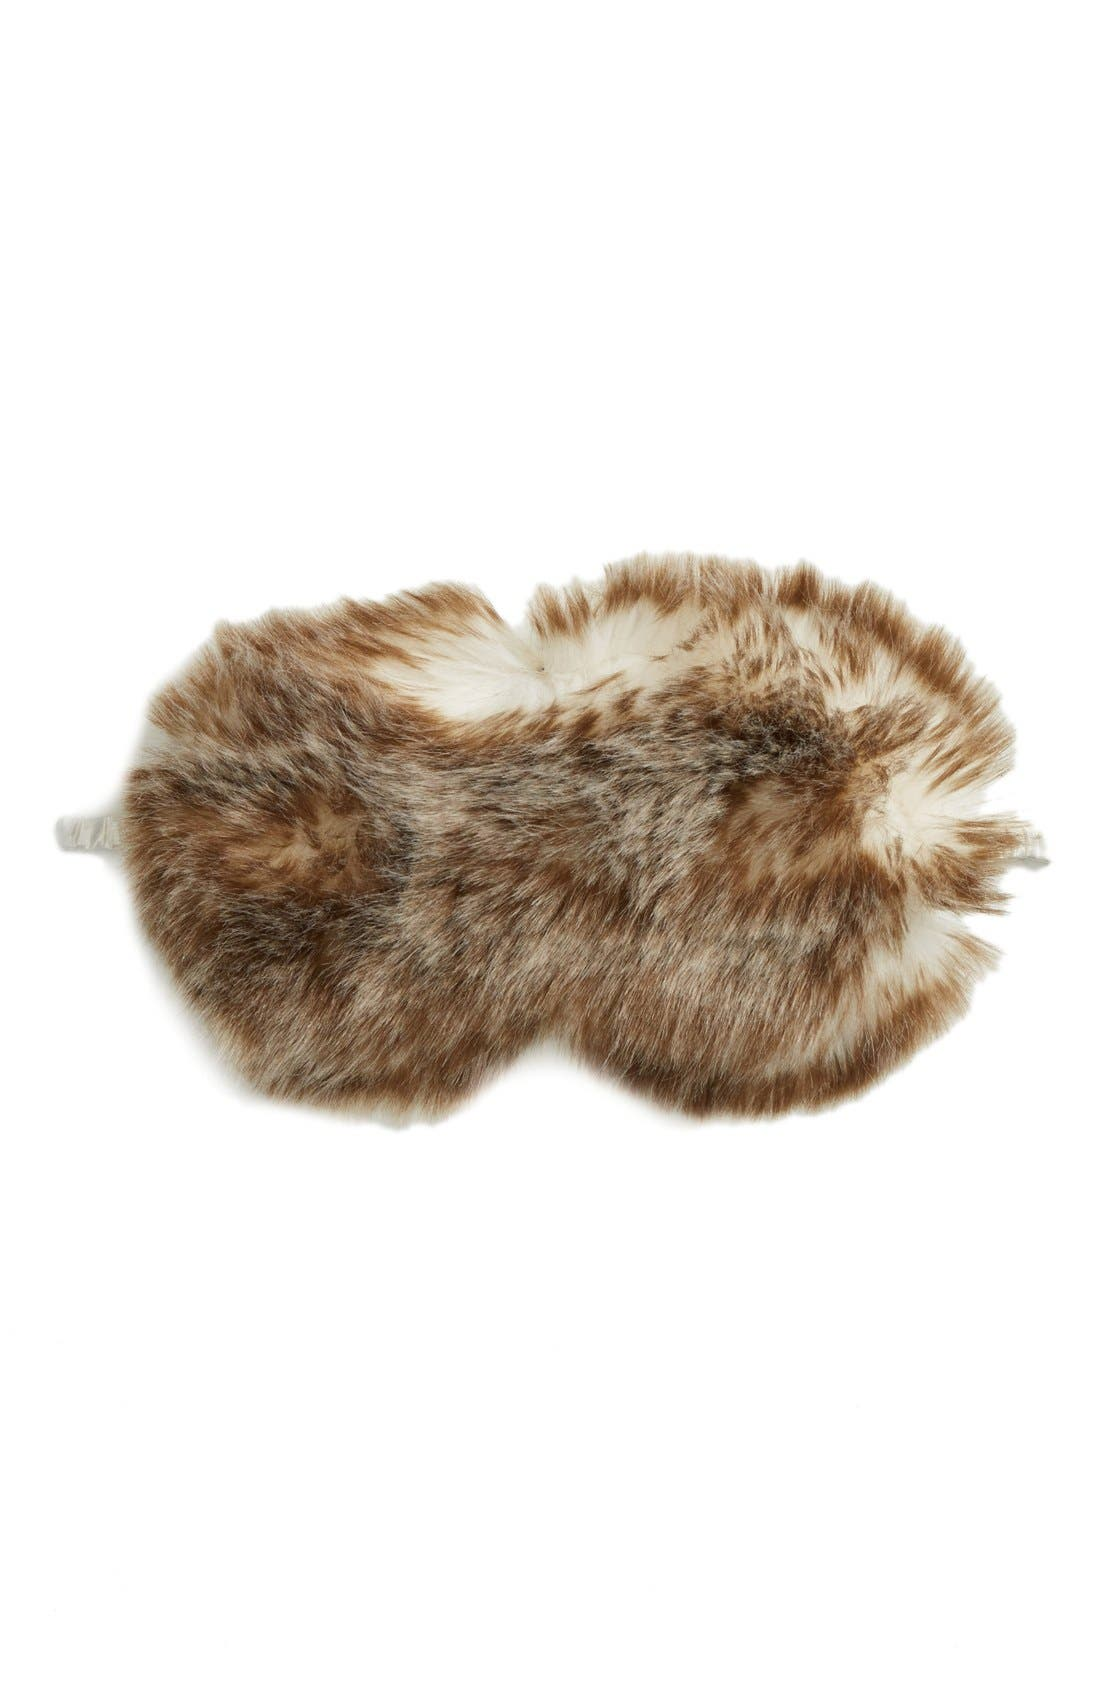 Alternate Image 1 Selected - Nordstrom Faux Fur Eye Mask